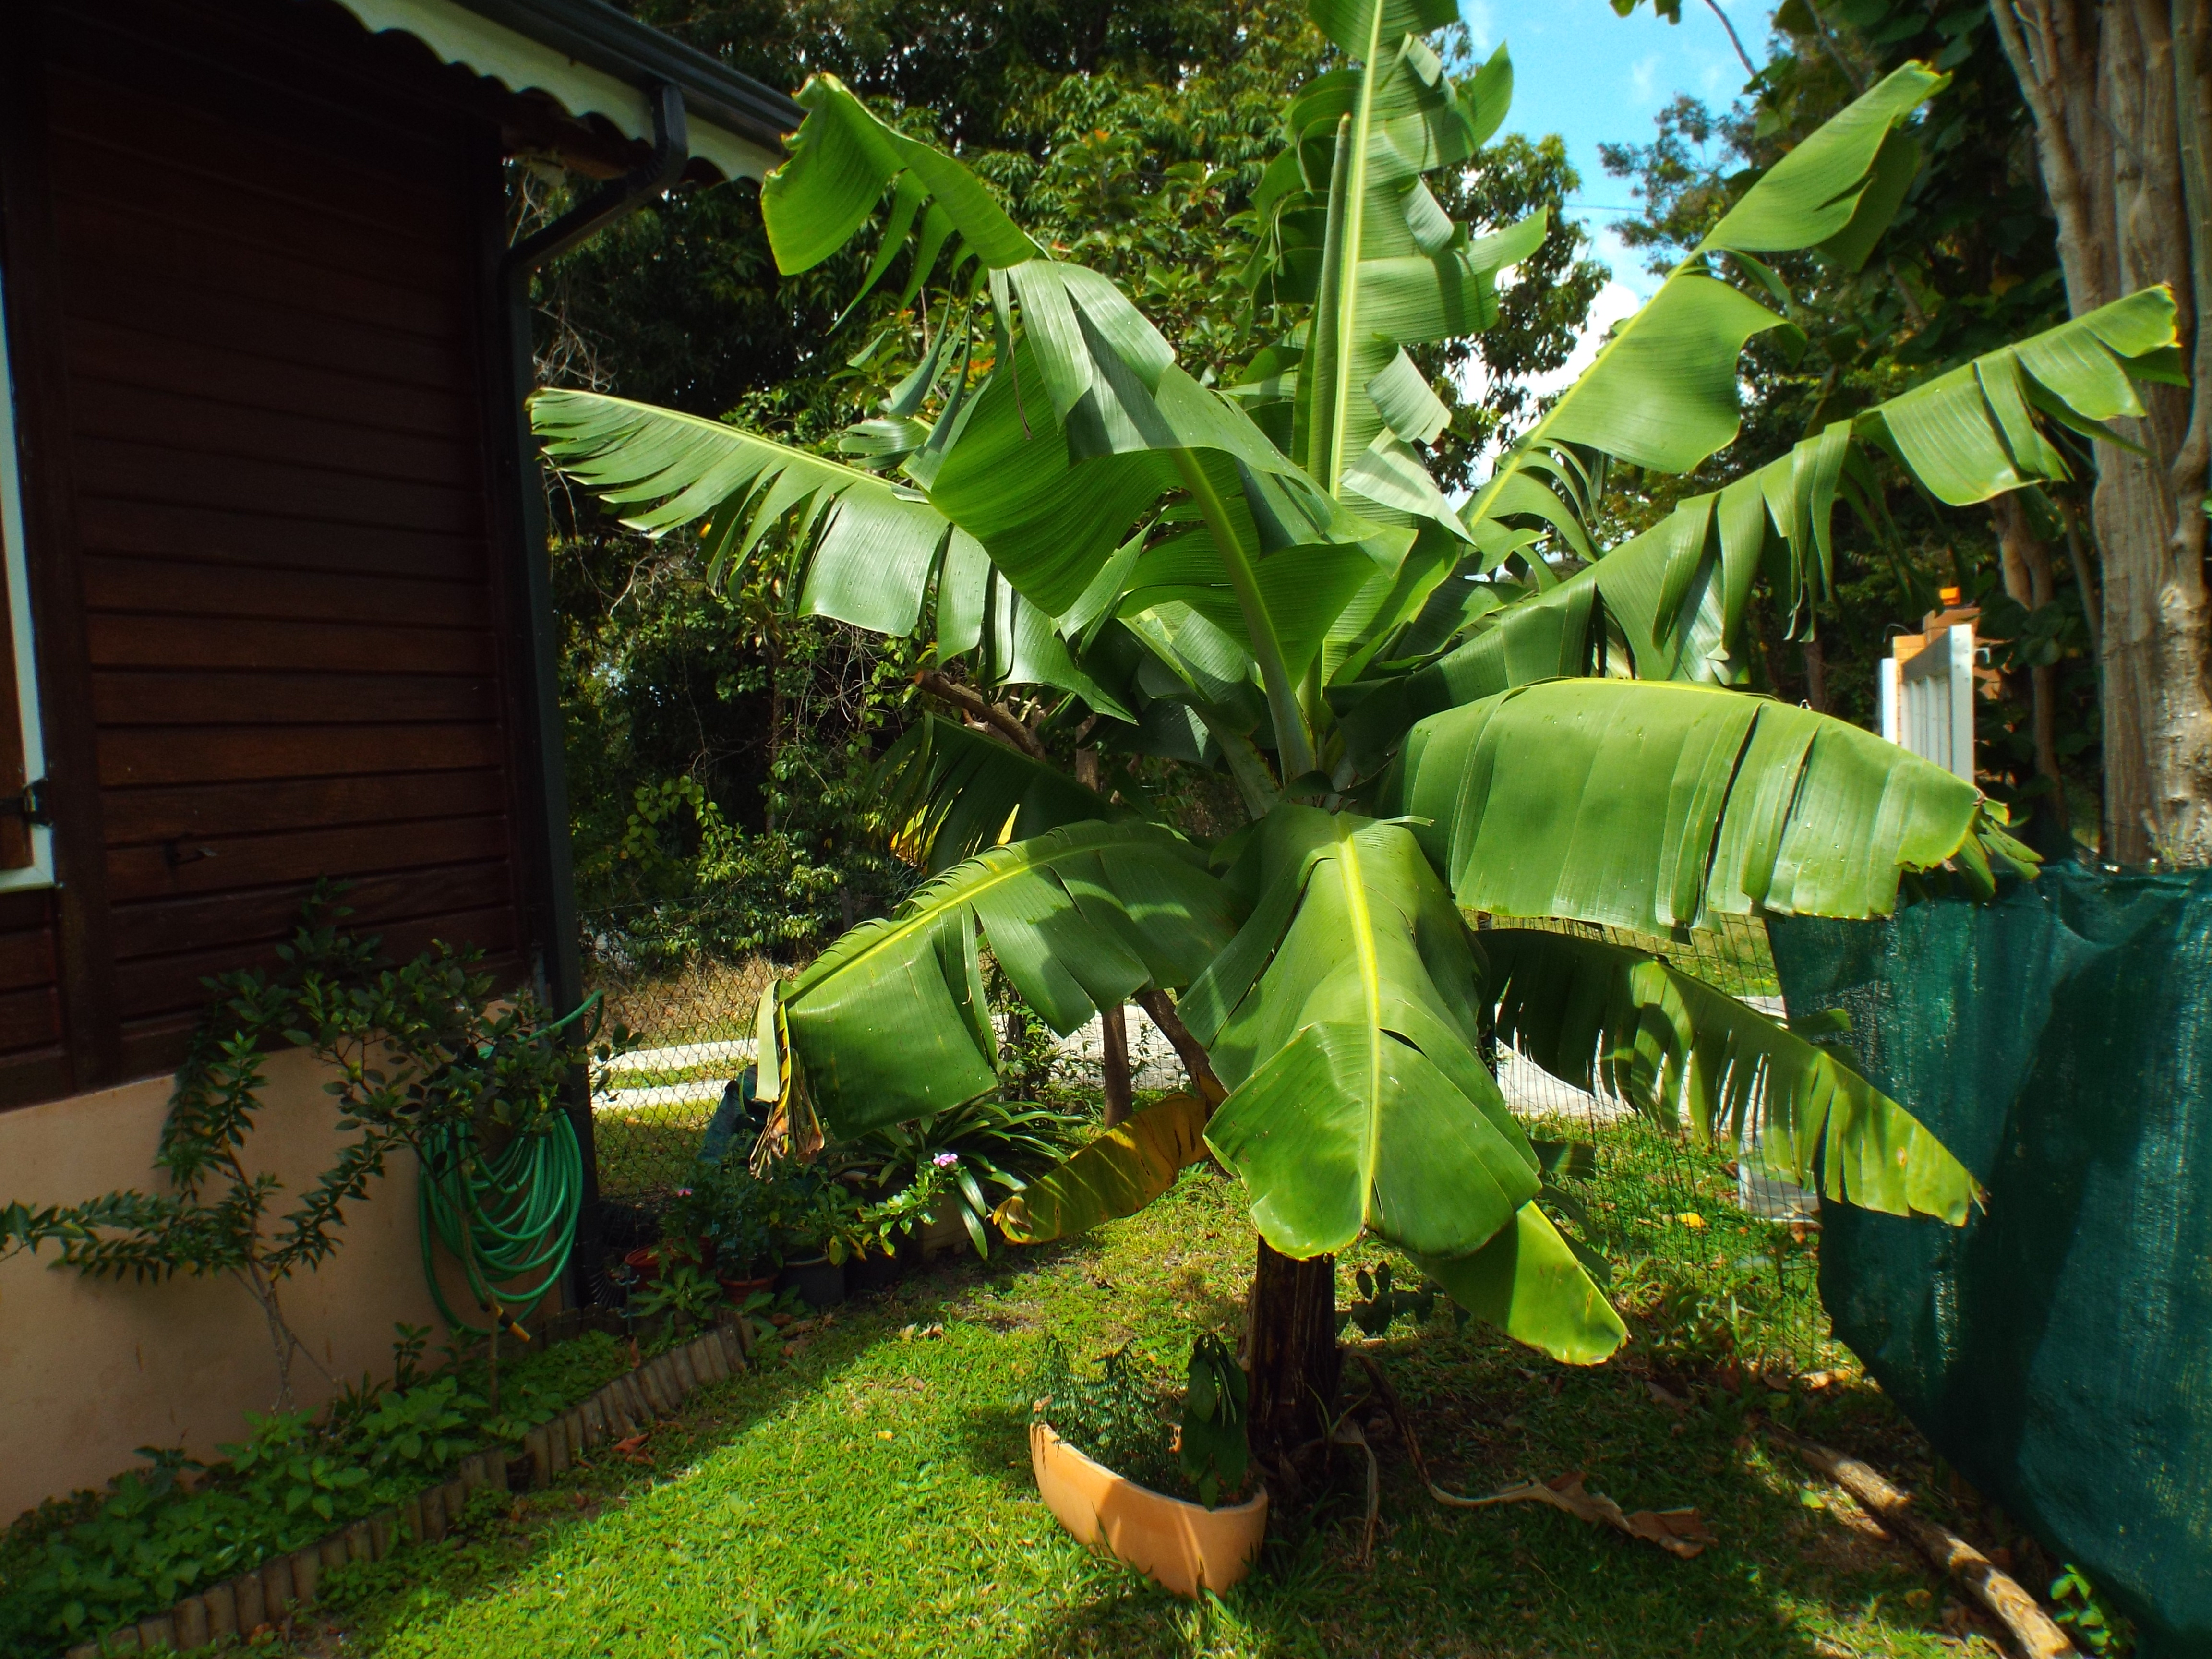 Bananier du jardin